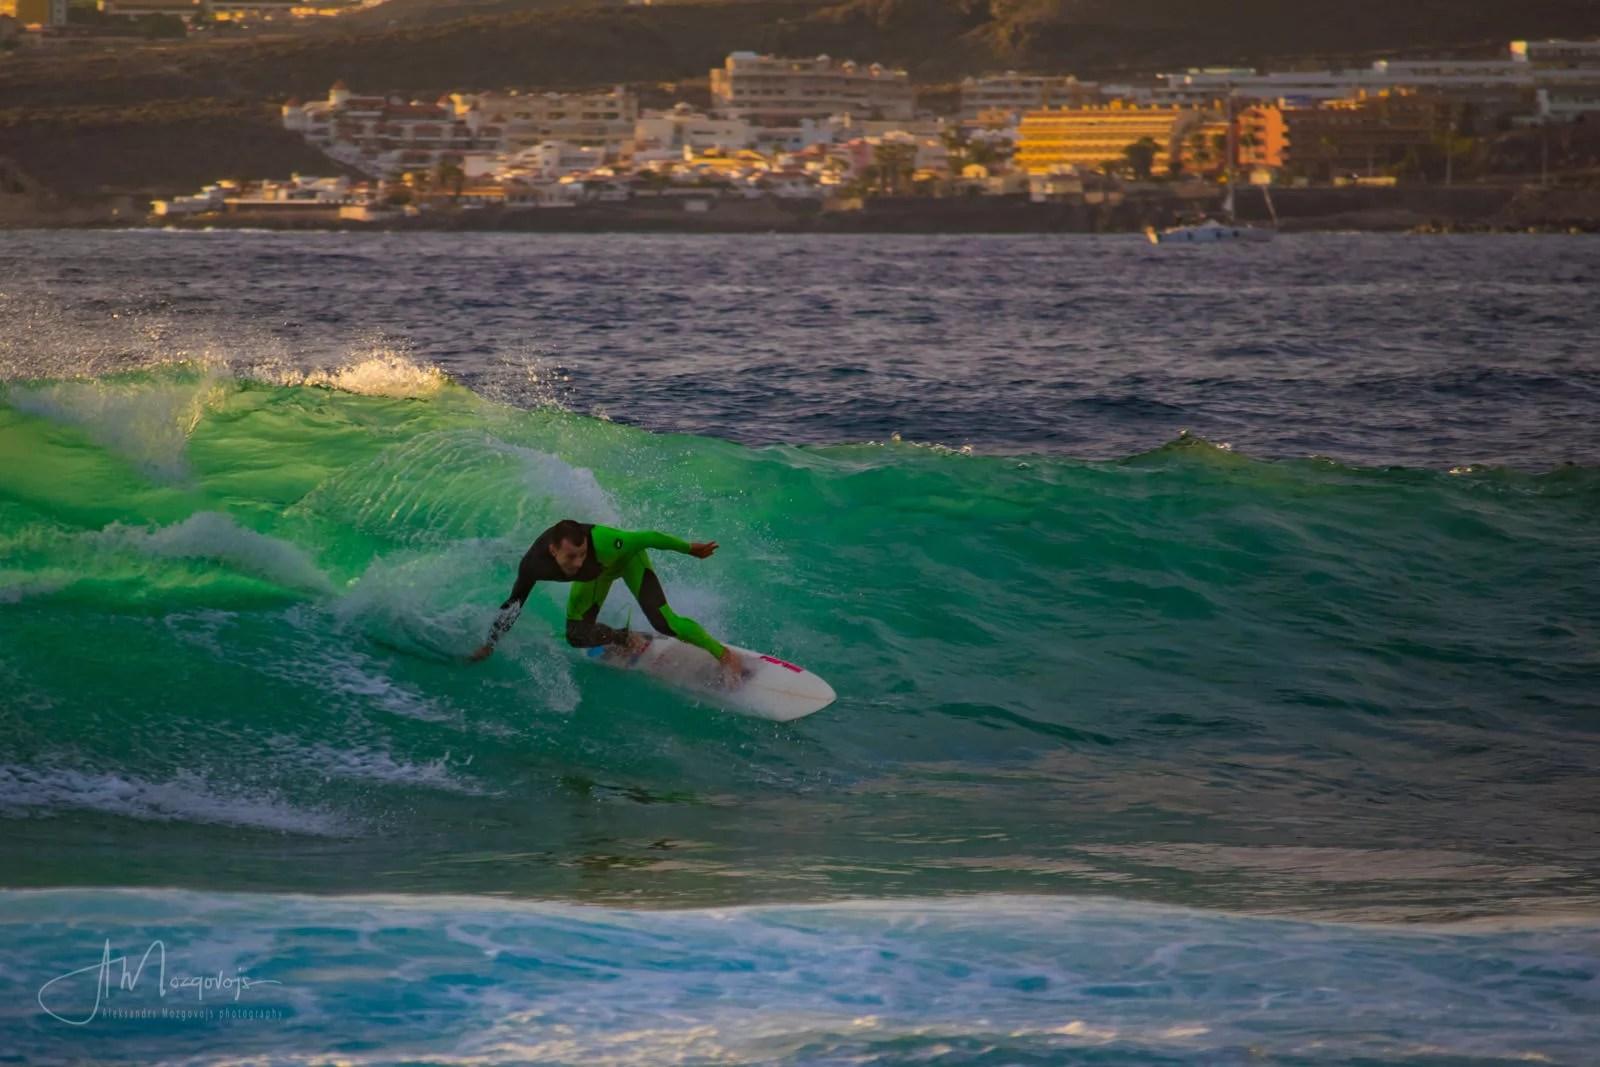 Surfer at Las Americas beach